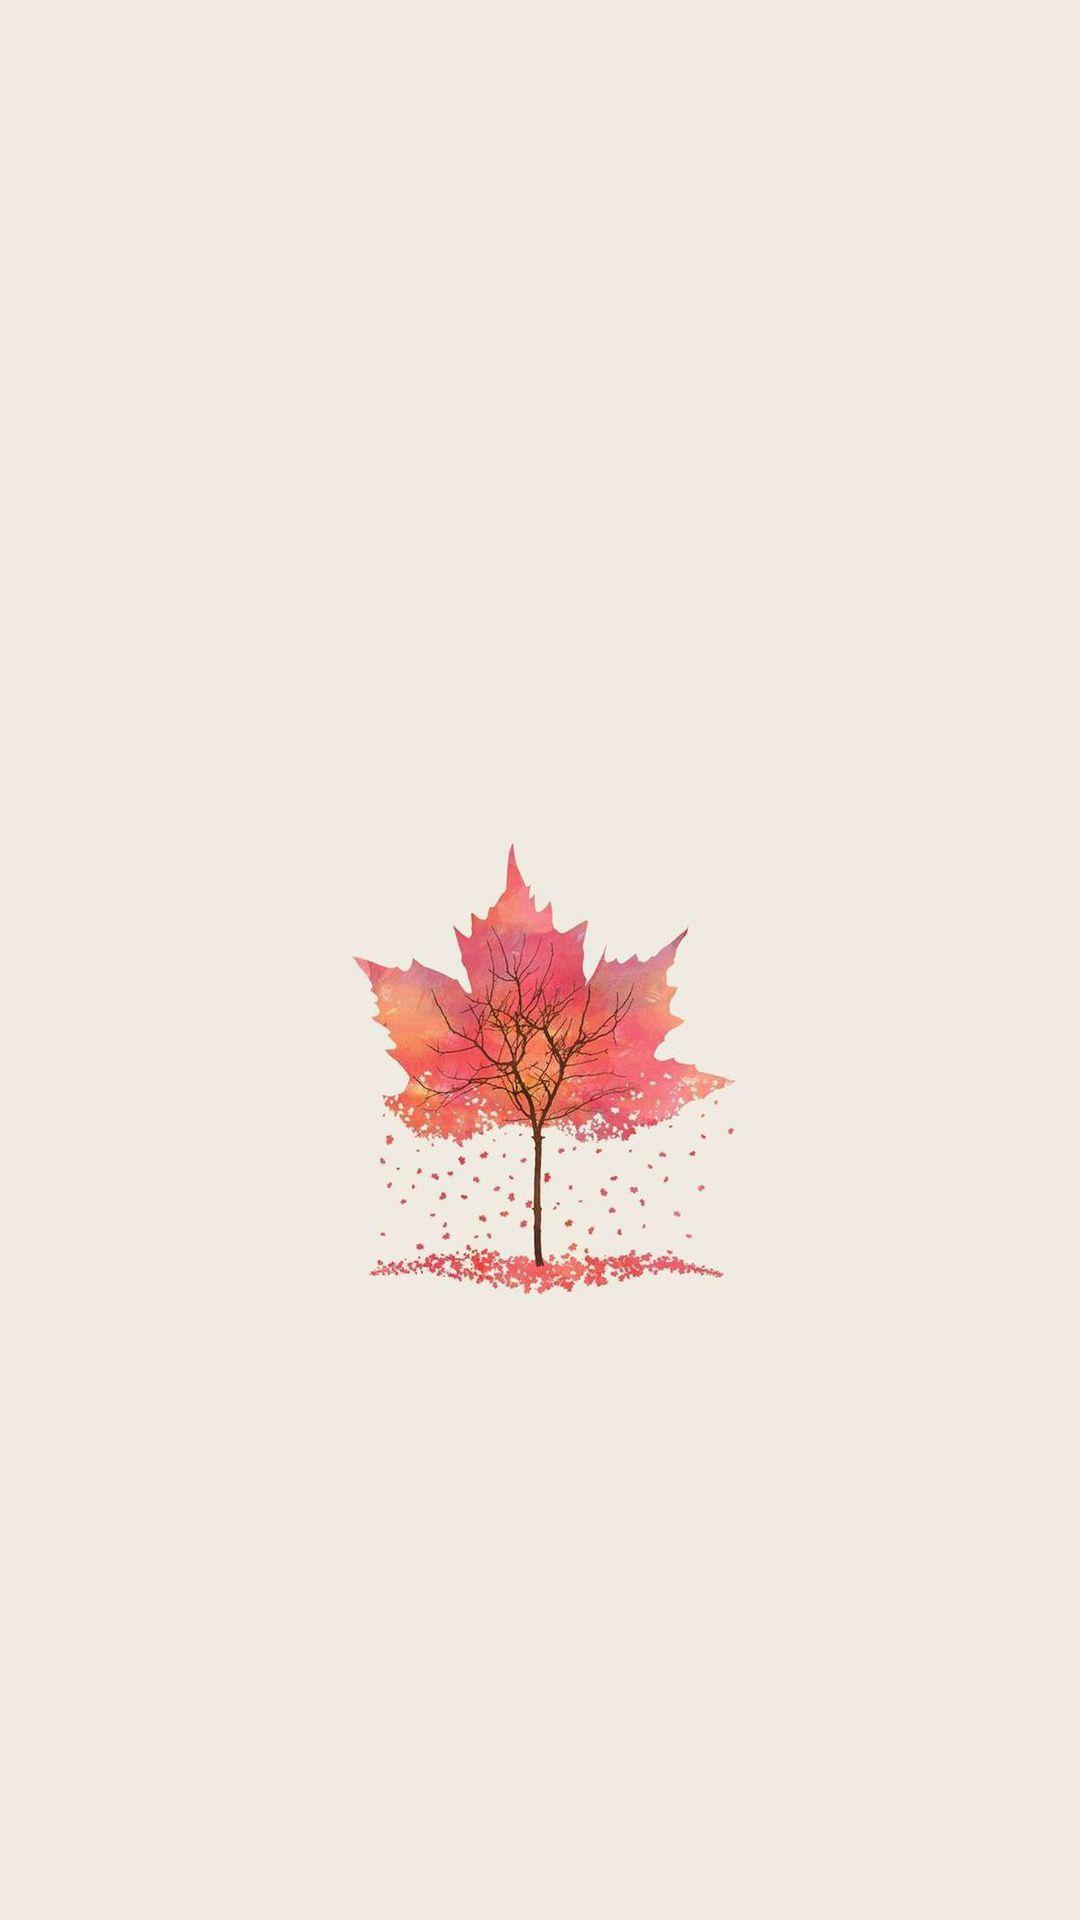 Autumn Minimal Wallpapers - Wallpaper Cave